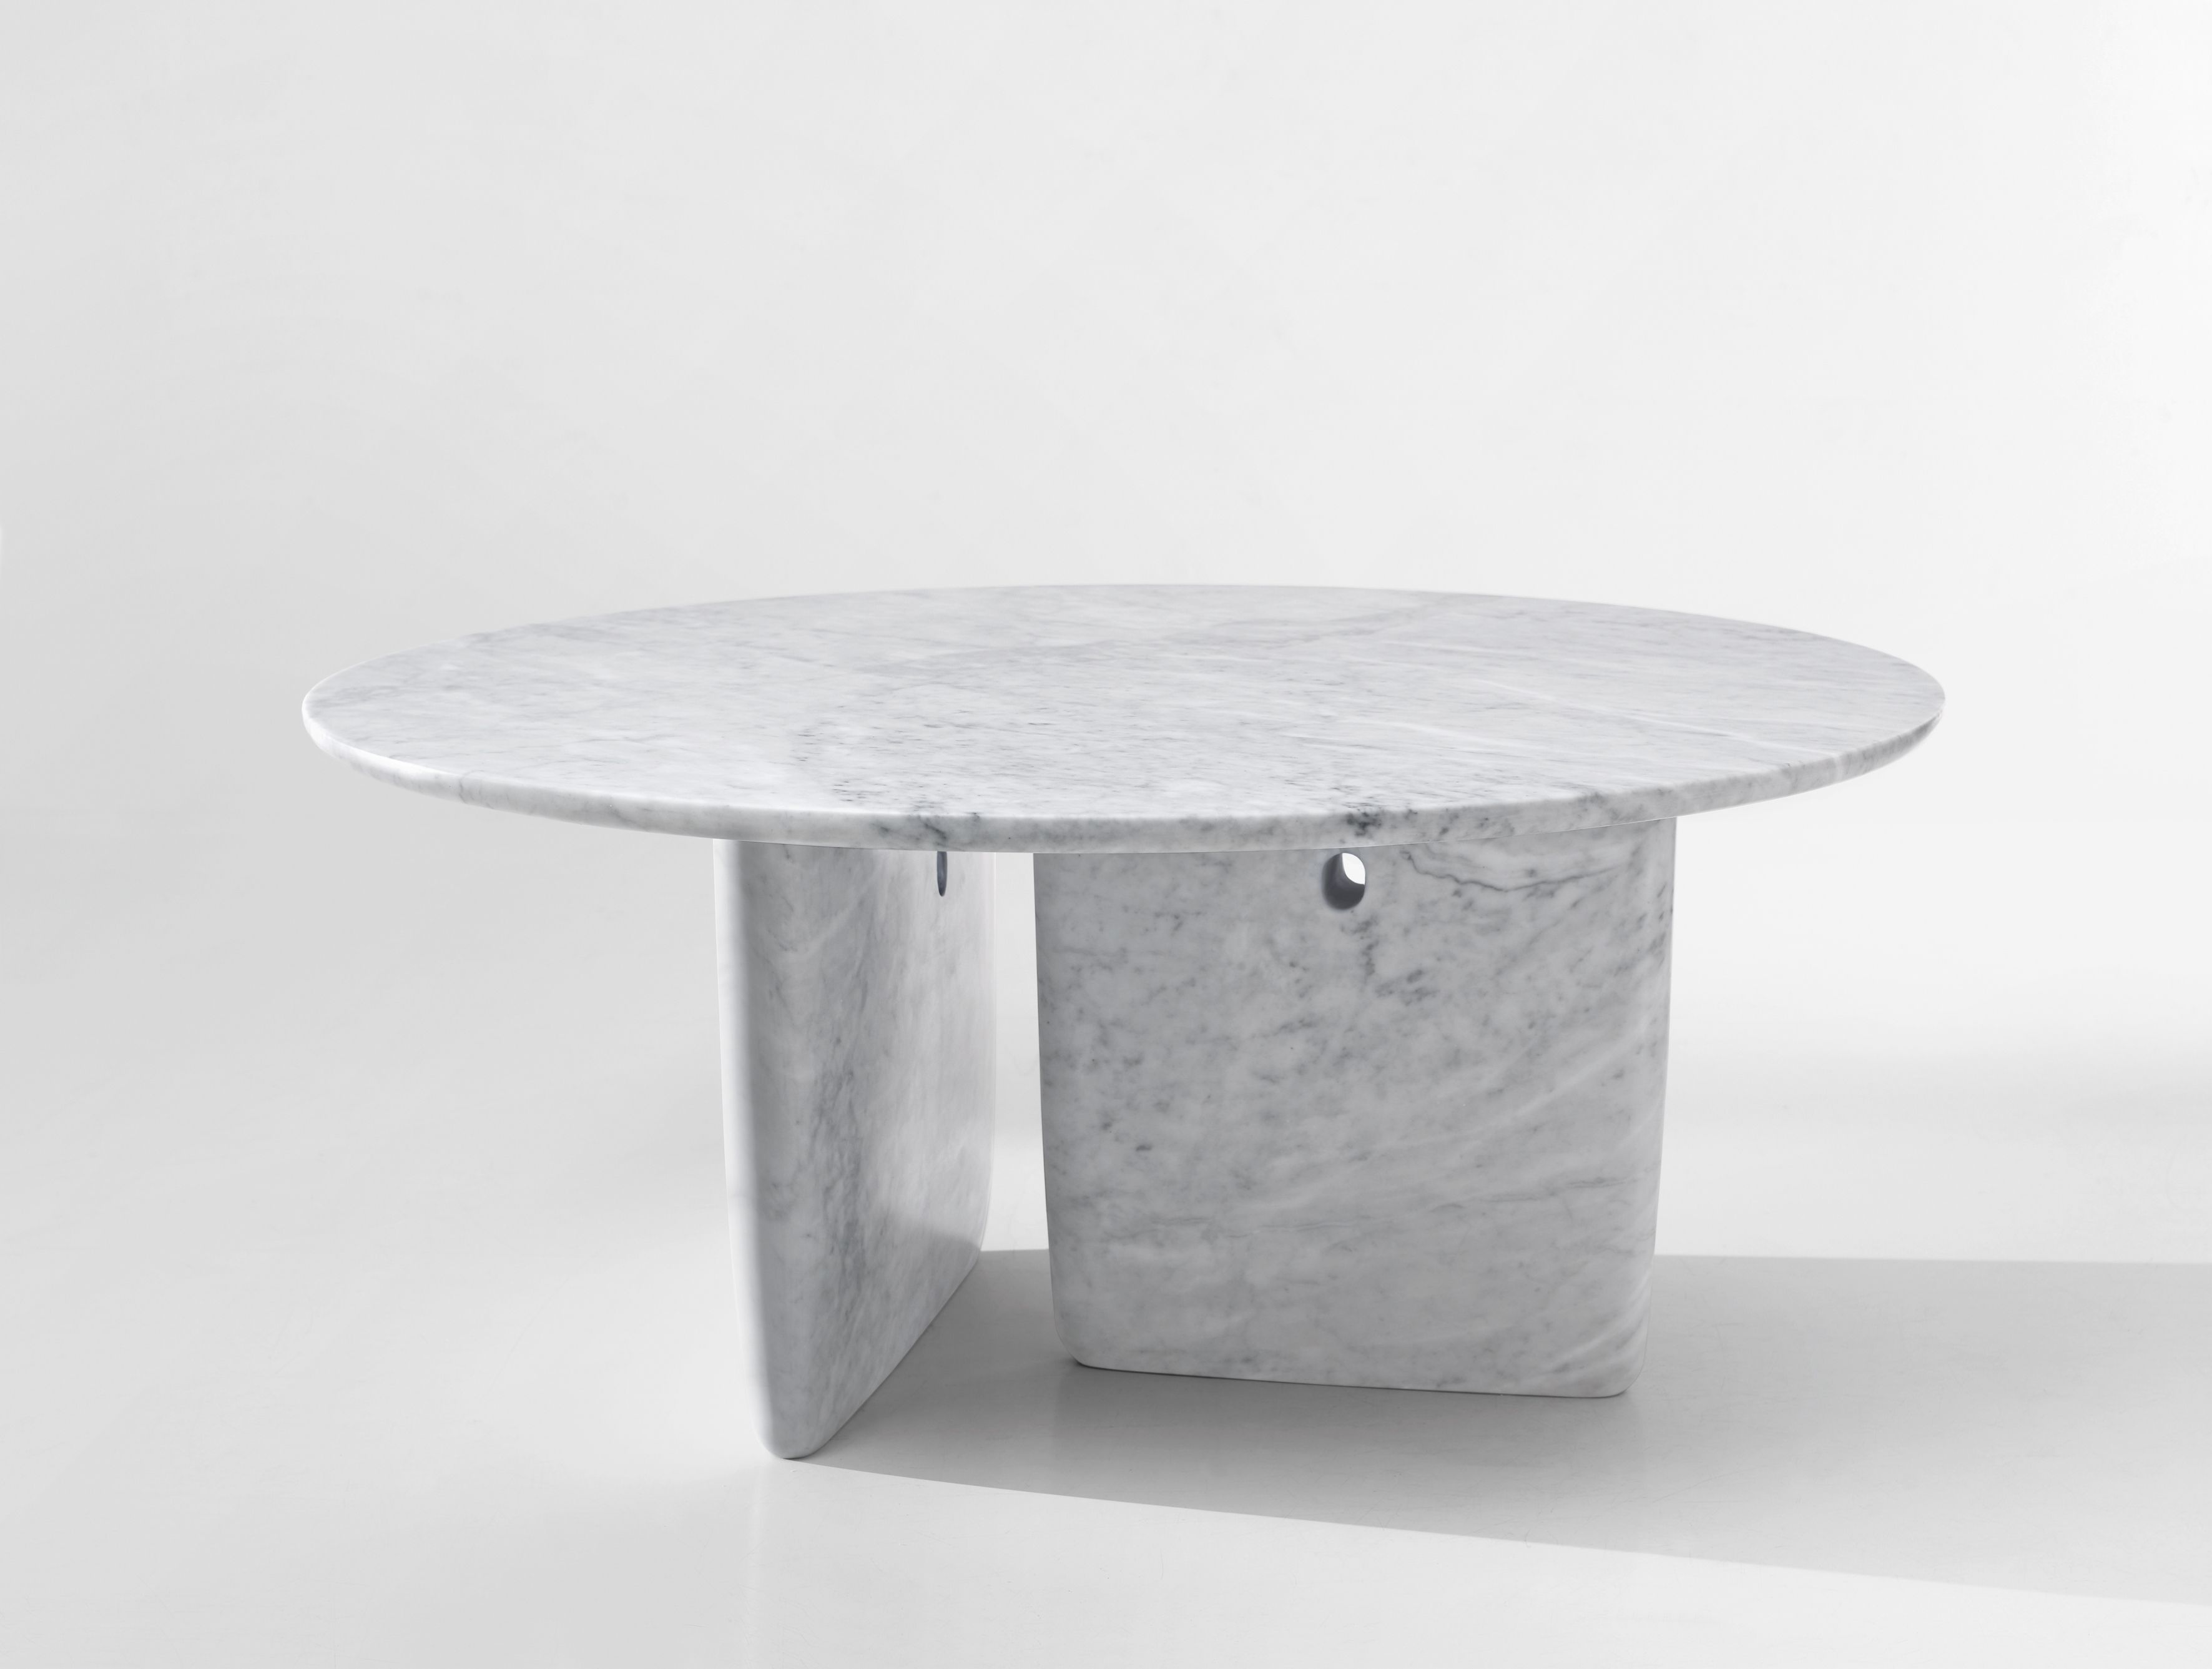 9f500db55a3711ba55d3cf52a7712050 Incroyable De Table Basse Anglais Conception